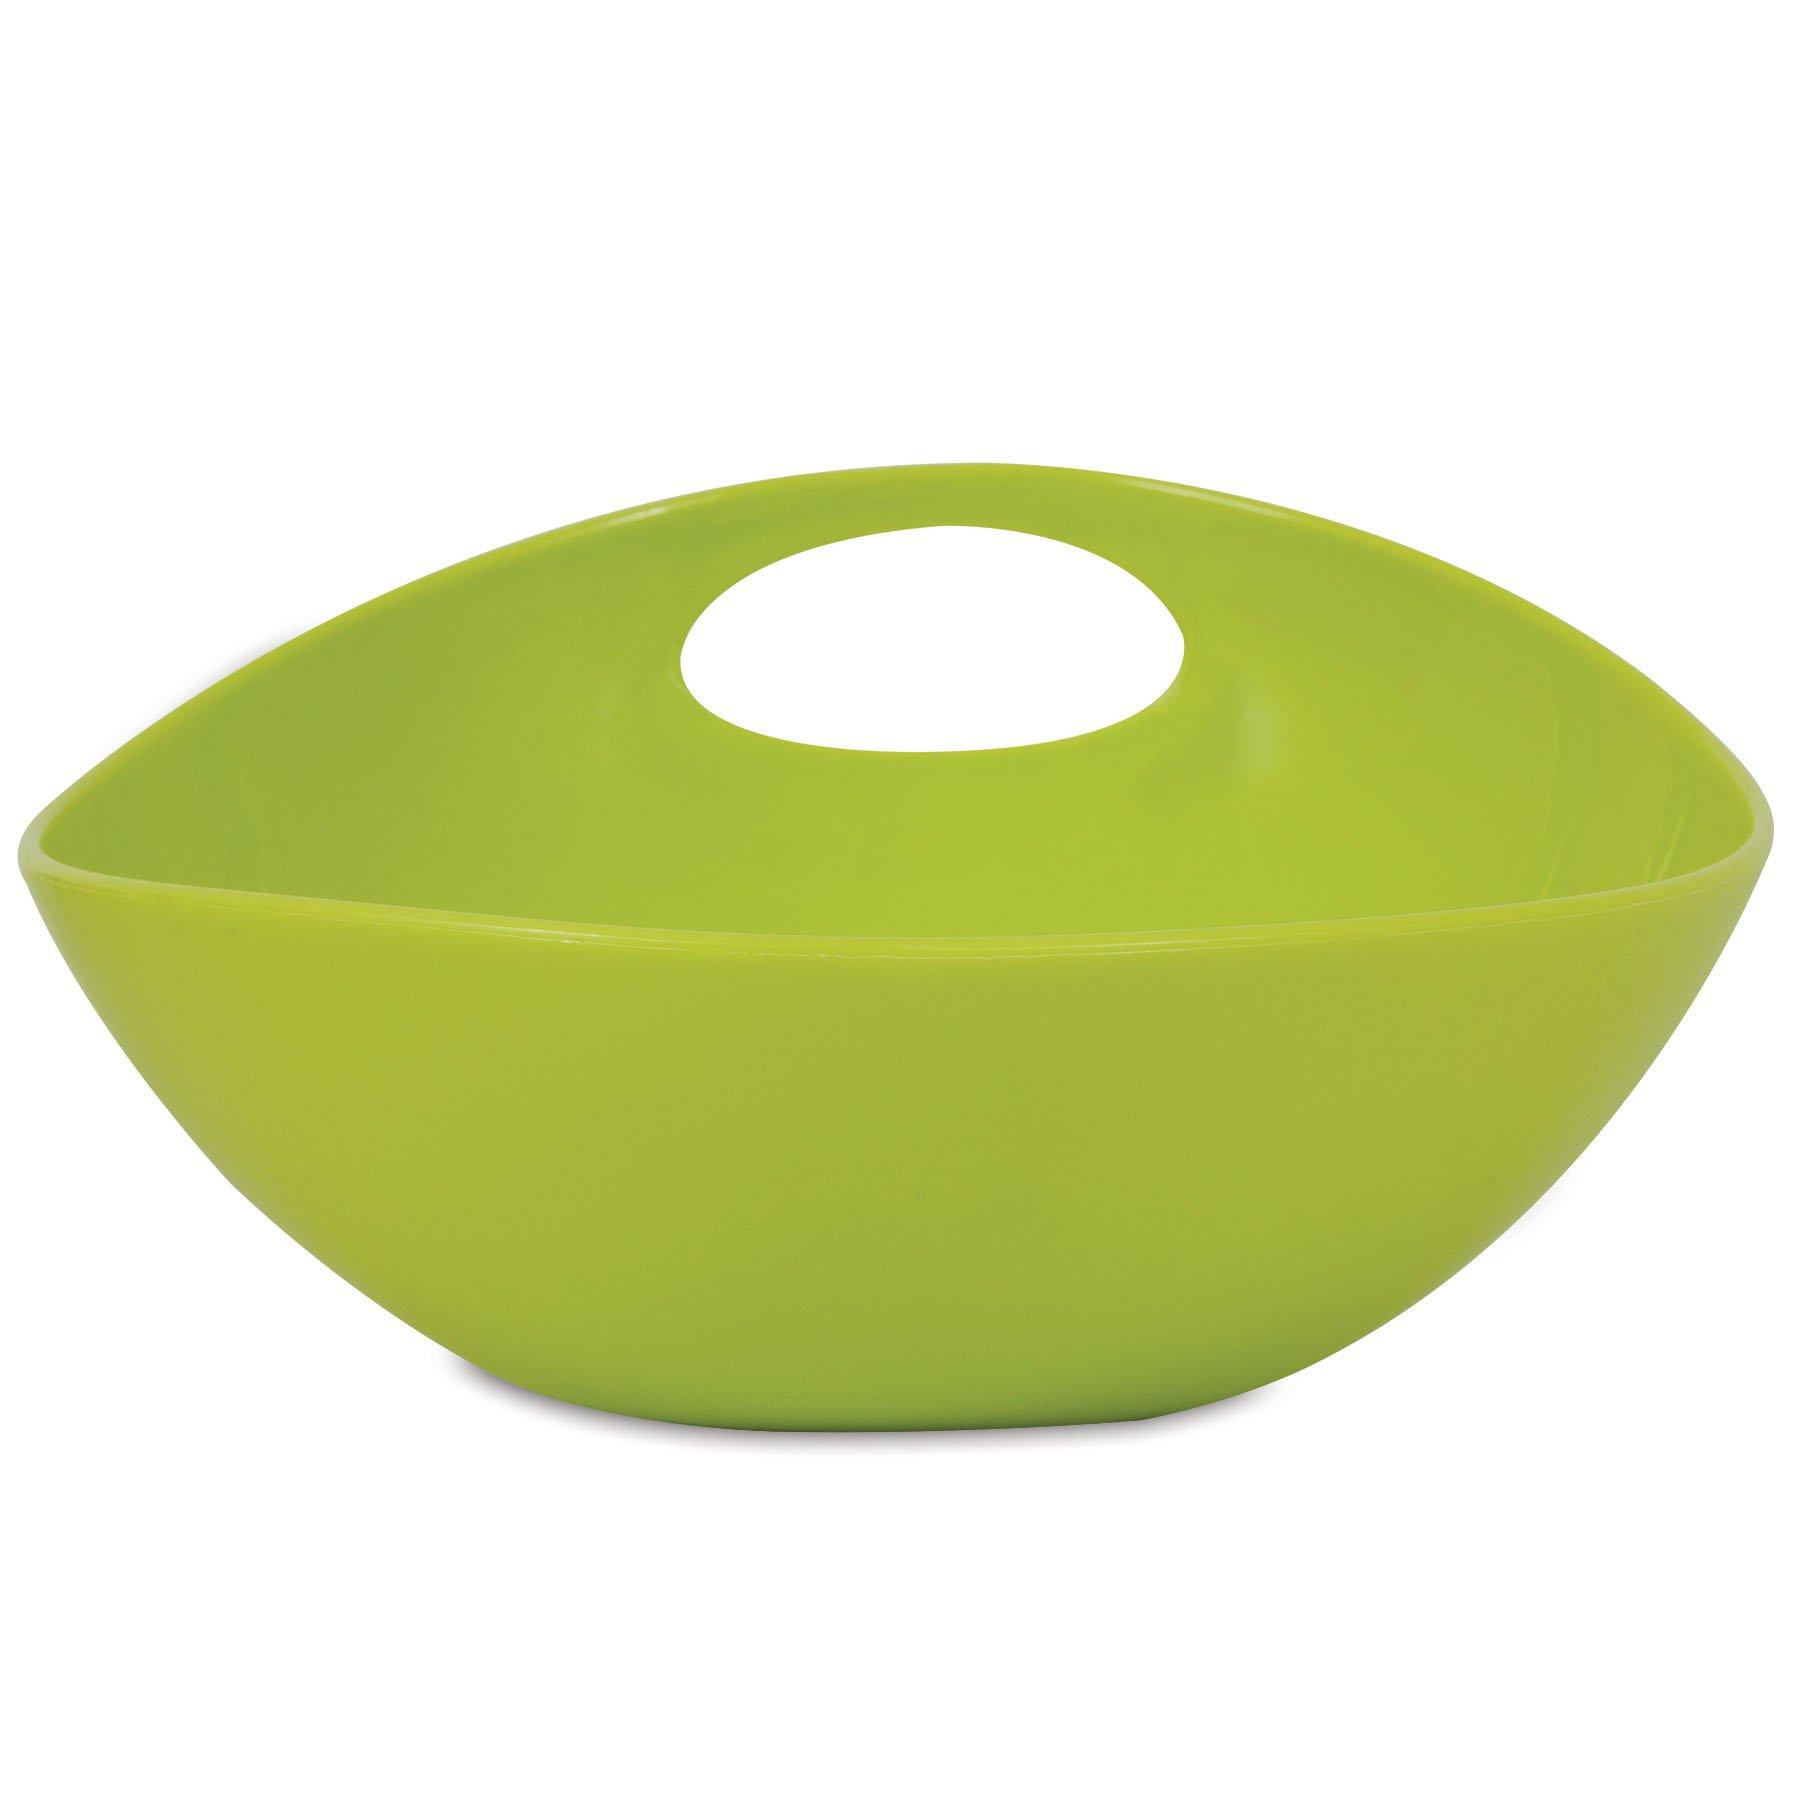 Wetnoz 23568 5-Cup Studio Scoop Dog Dish, Large, Pear